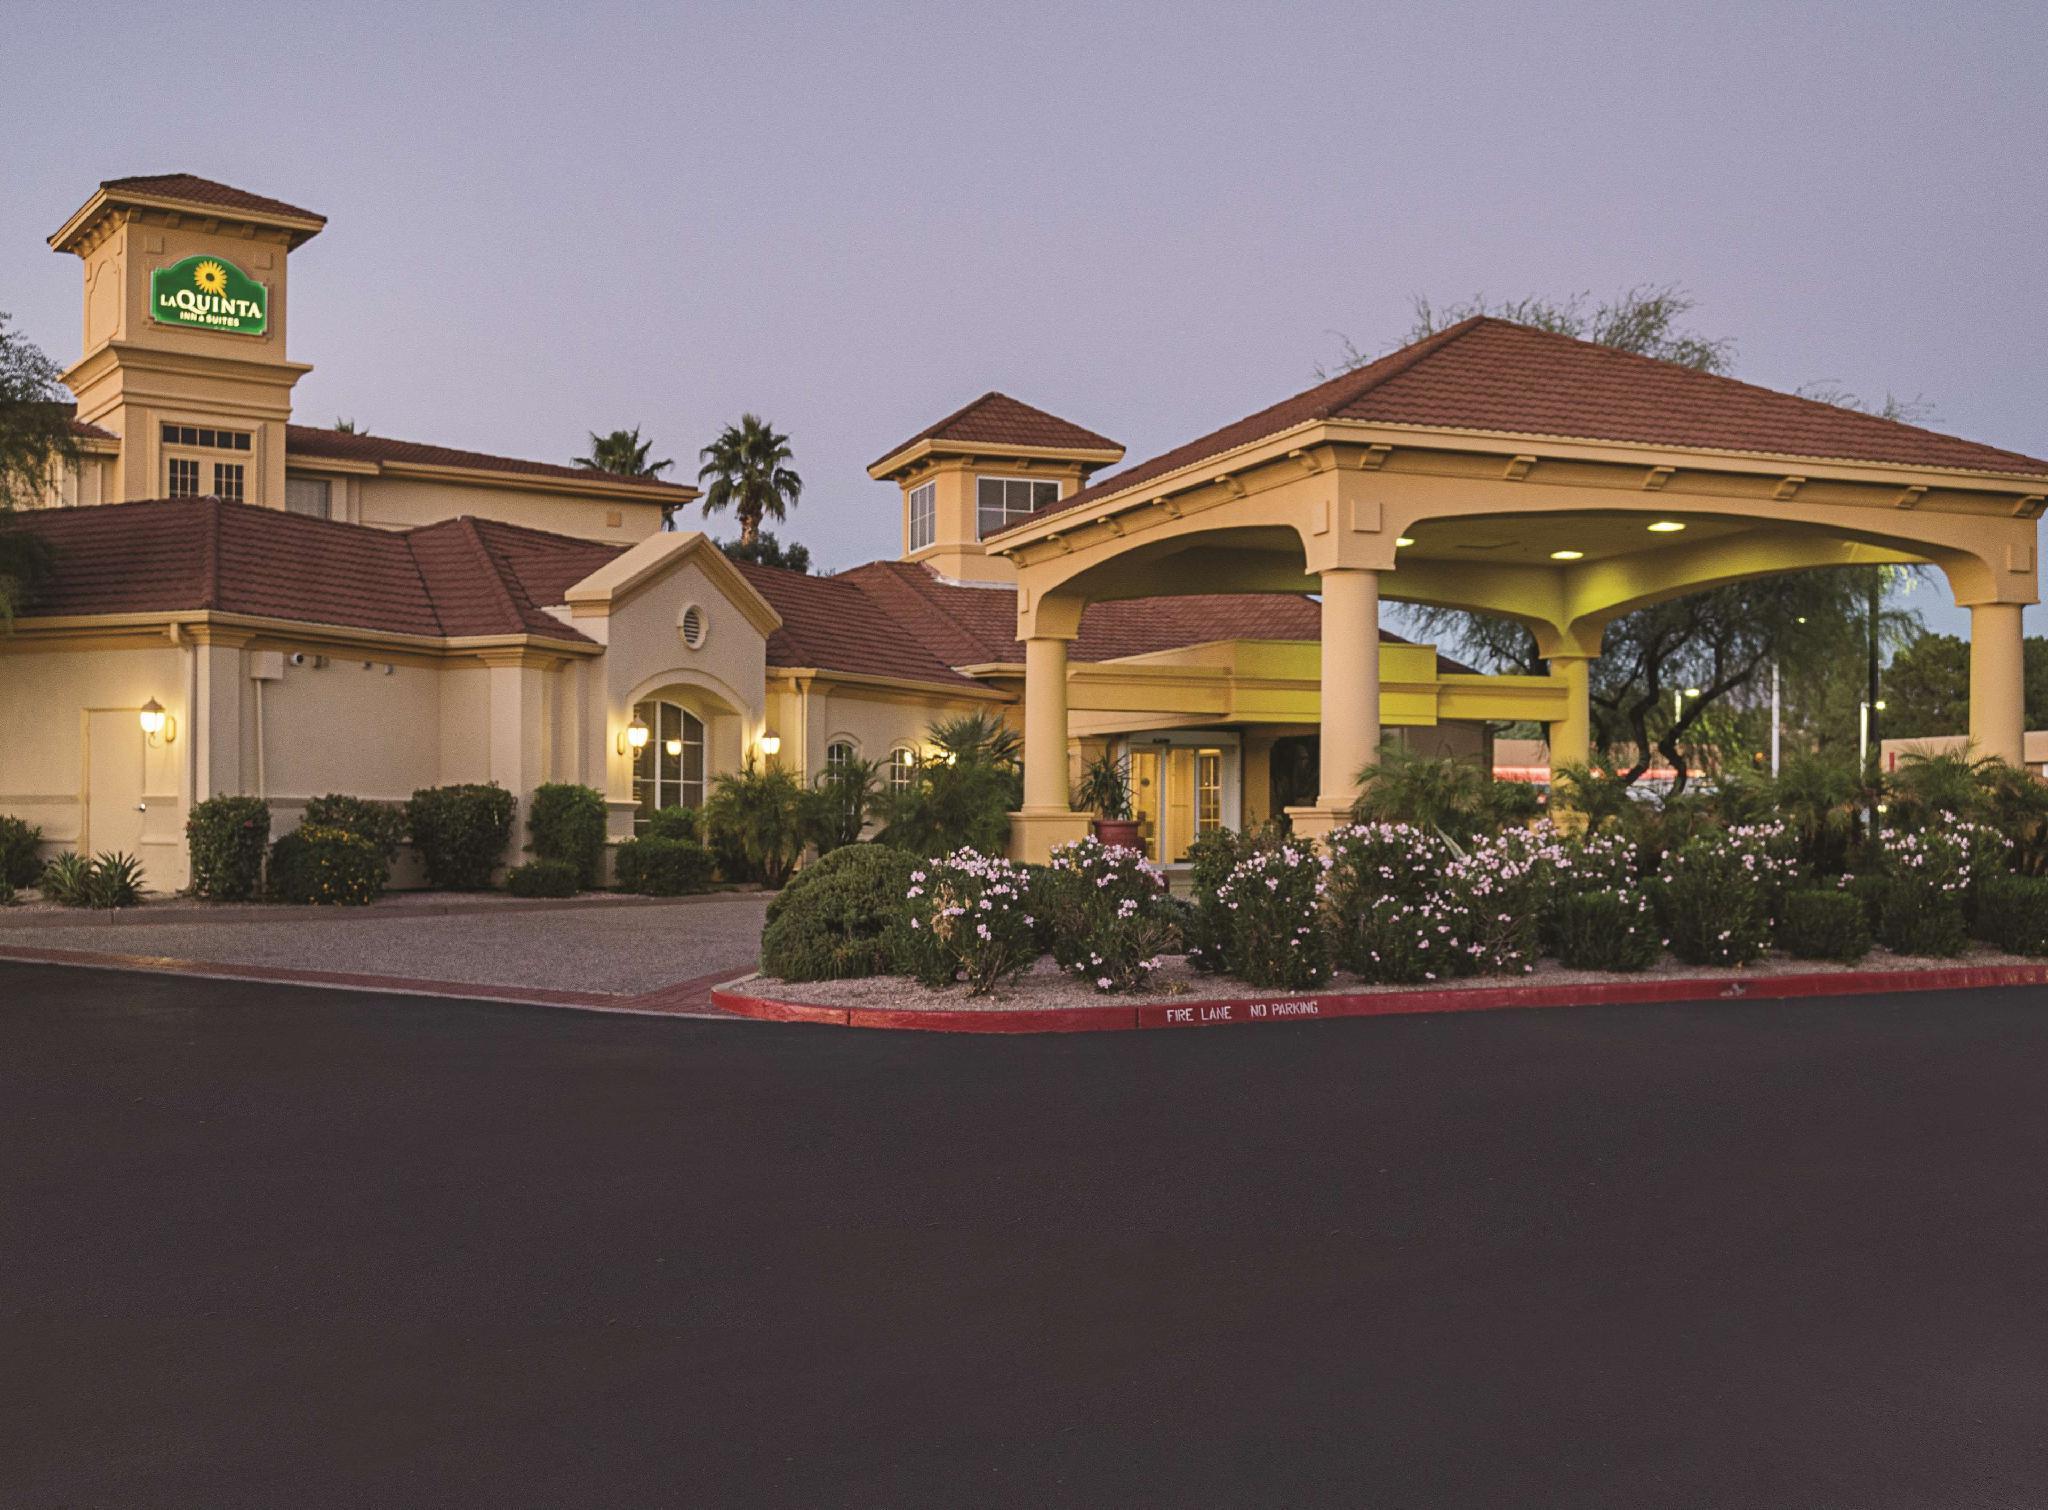 La Quinta Inn And Suites By Wyndham Phoenix Scottsdale